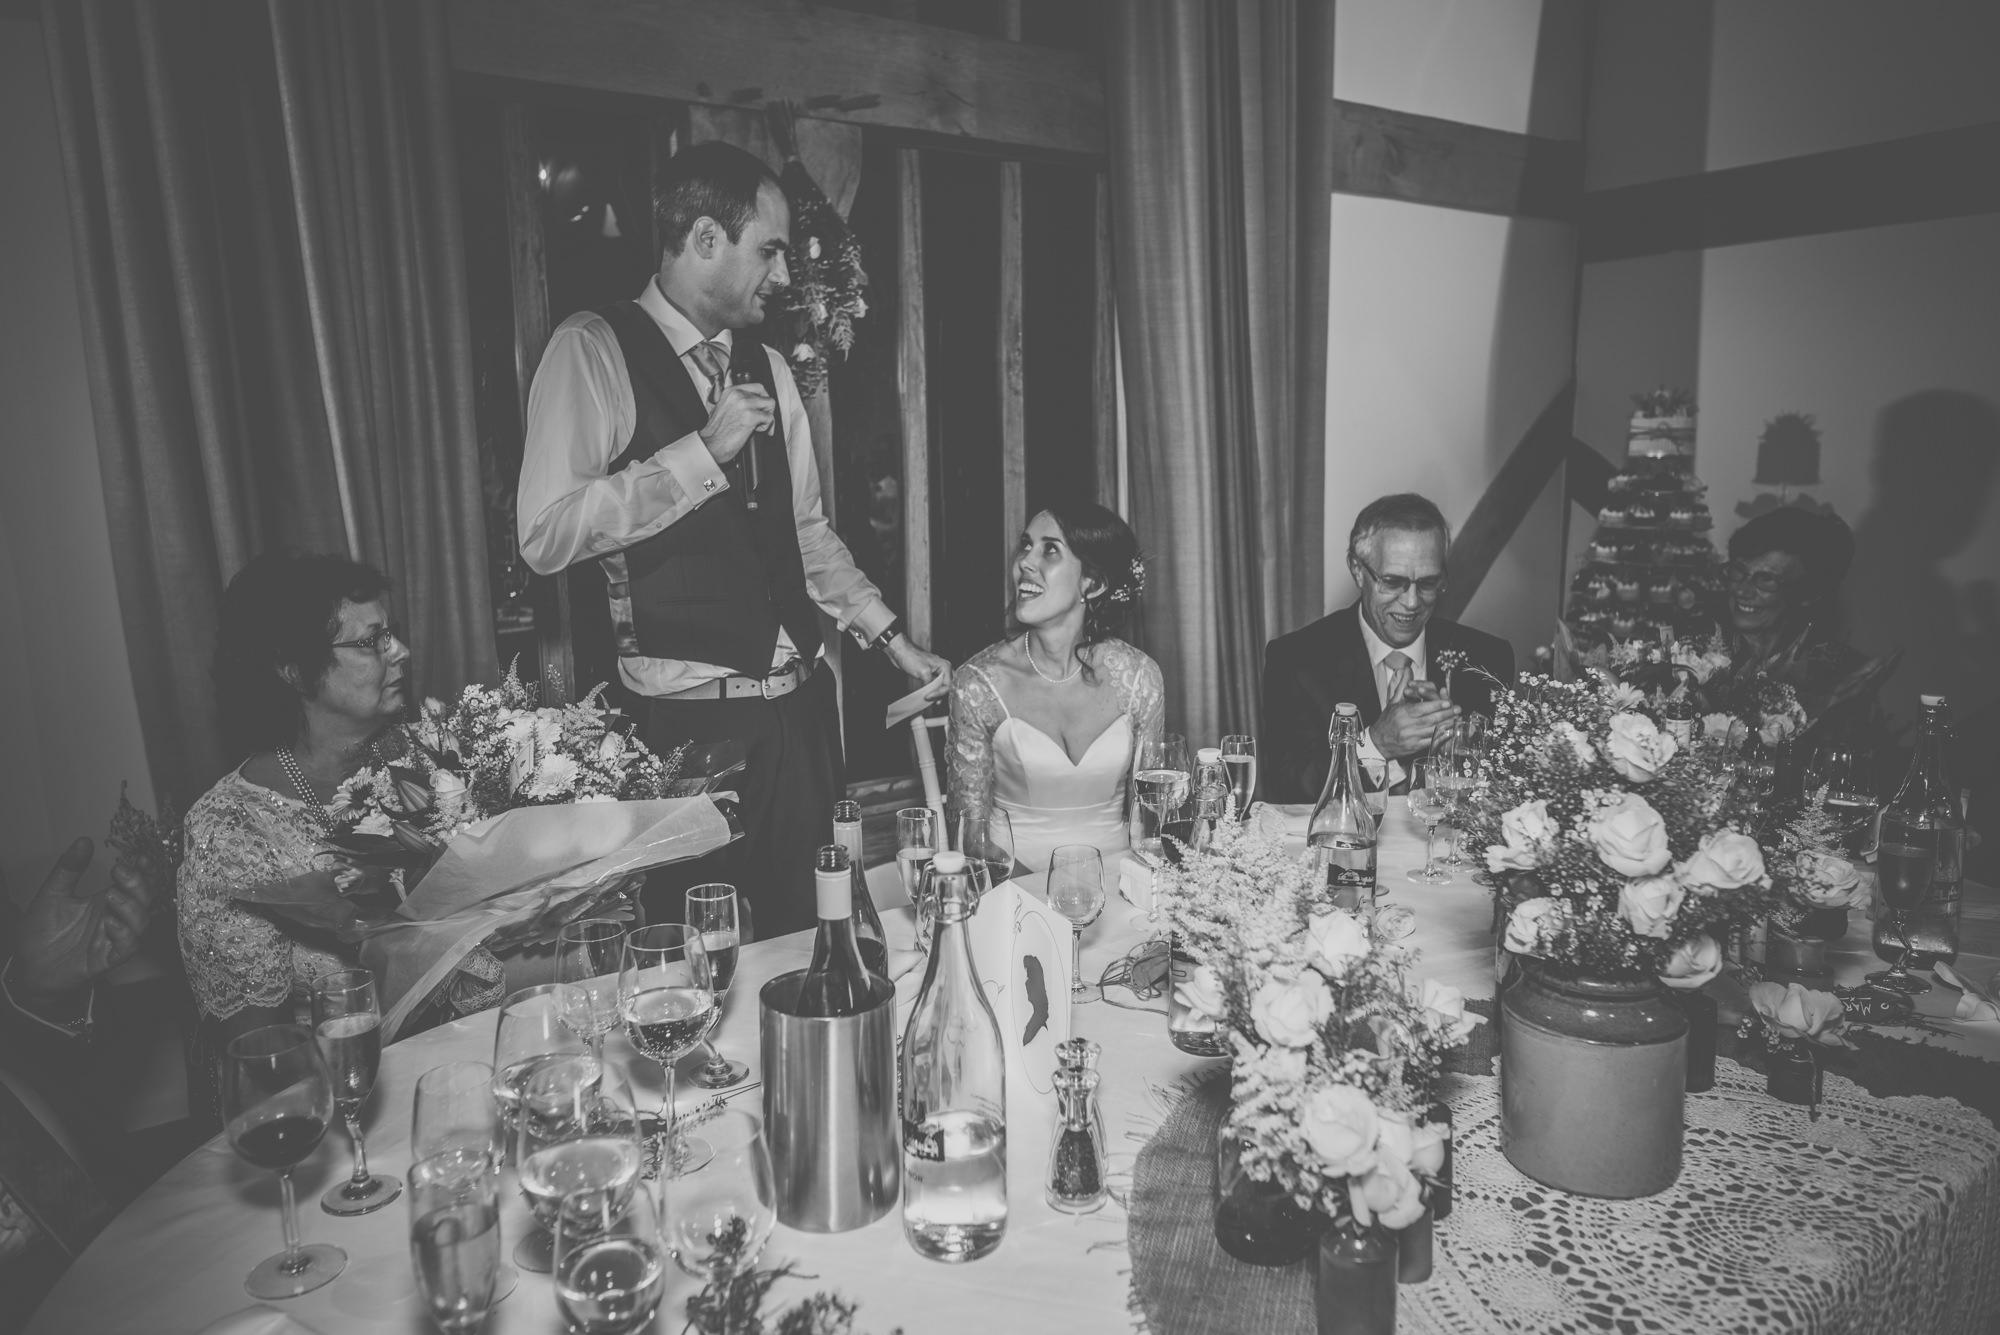 Charisse-and-James-wedding-in-Cain-Manor-Venue-Hampshire-Manu-Mendoza-Wedding-Photography-471.jpg